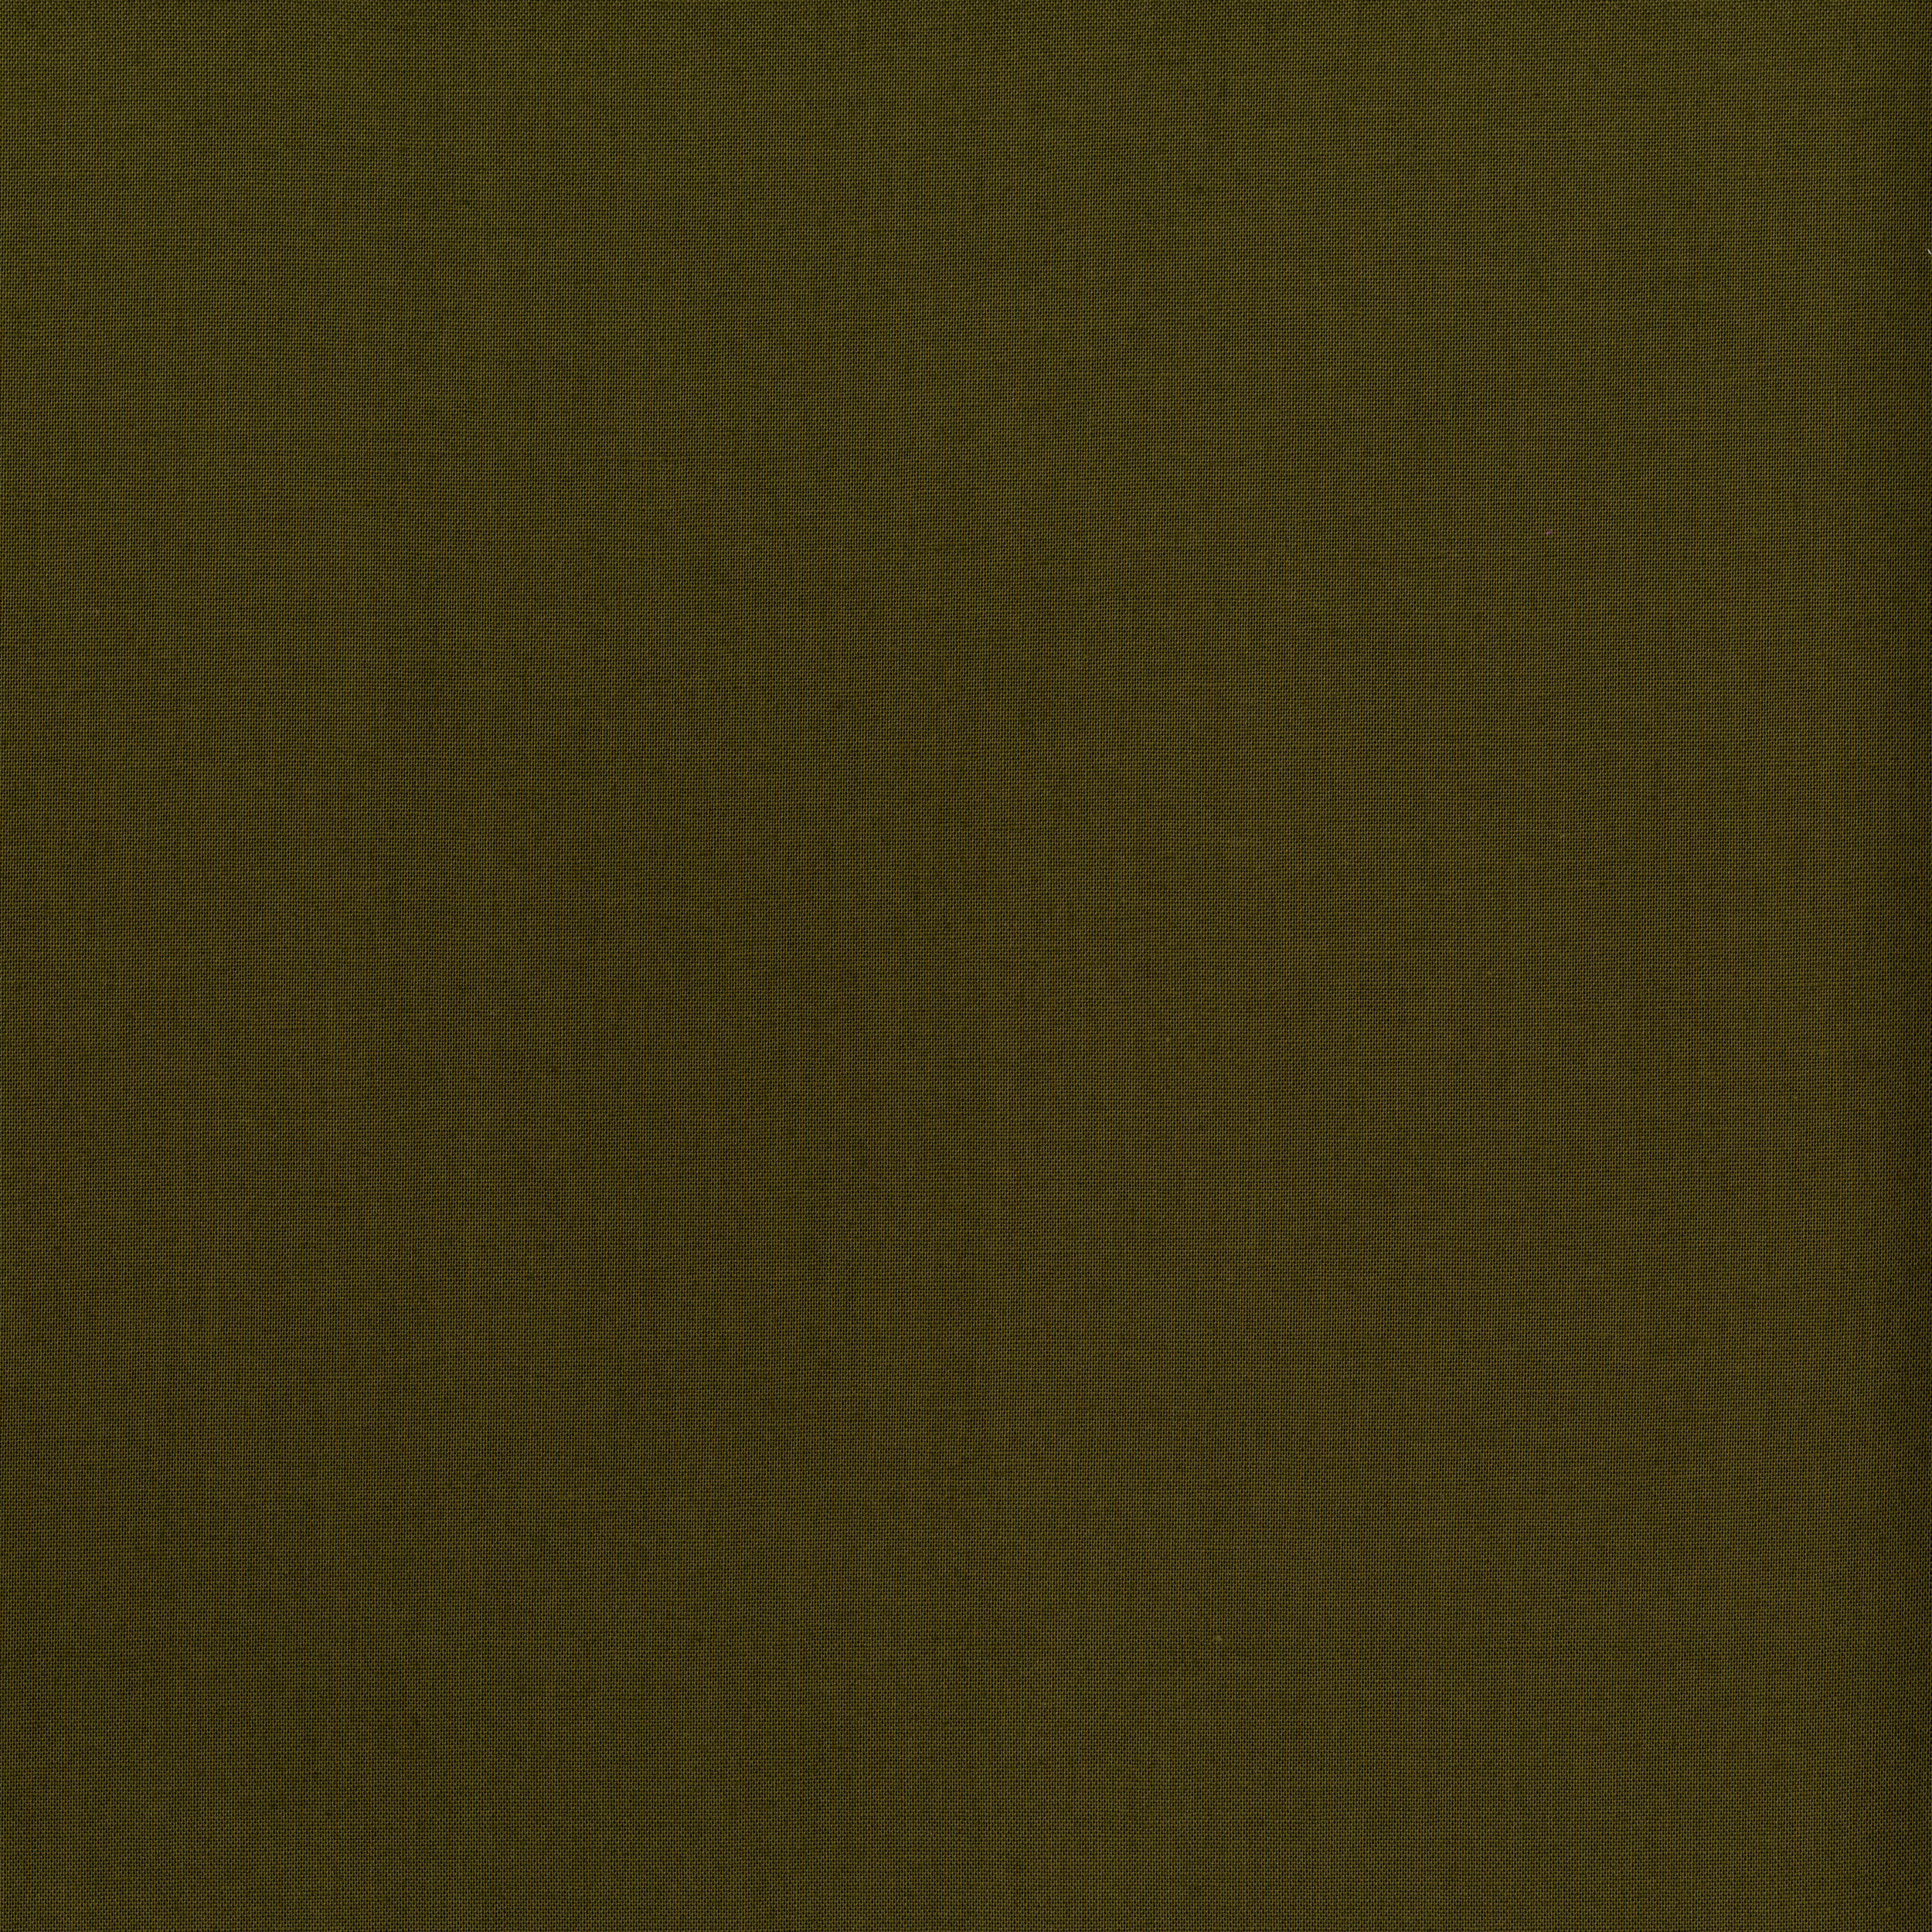 9617-350 ARMY GREEN